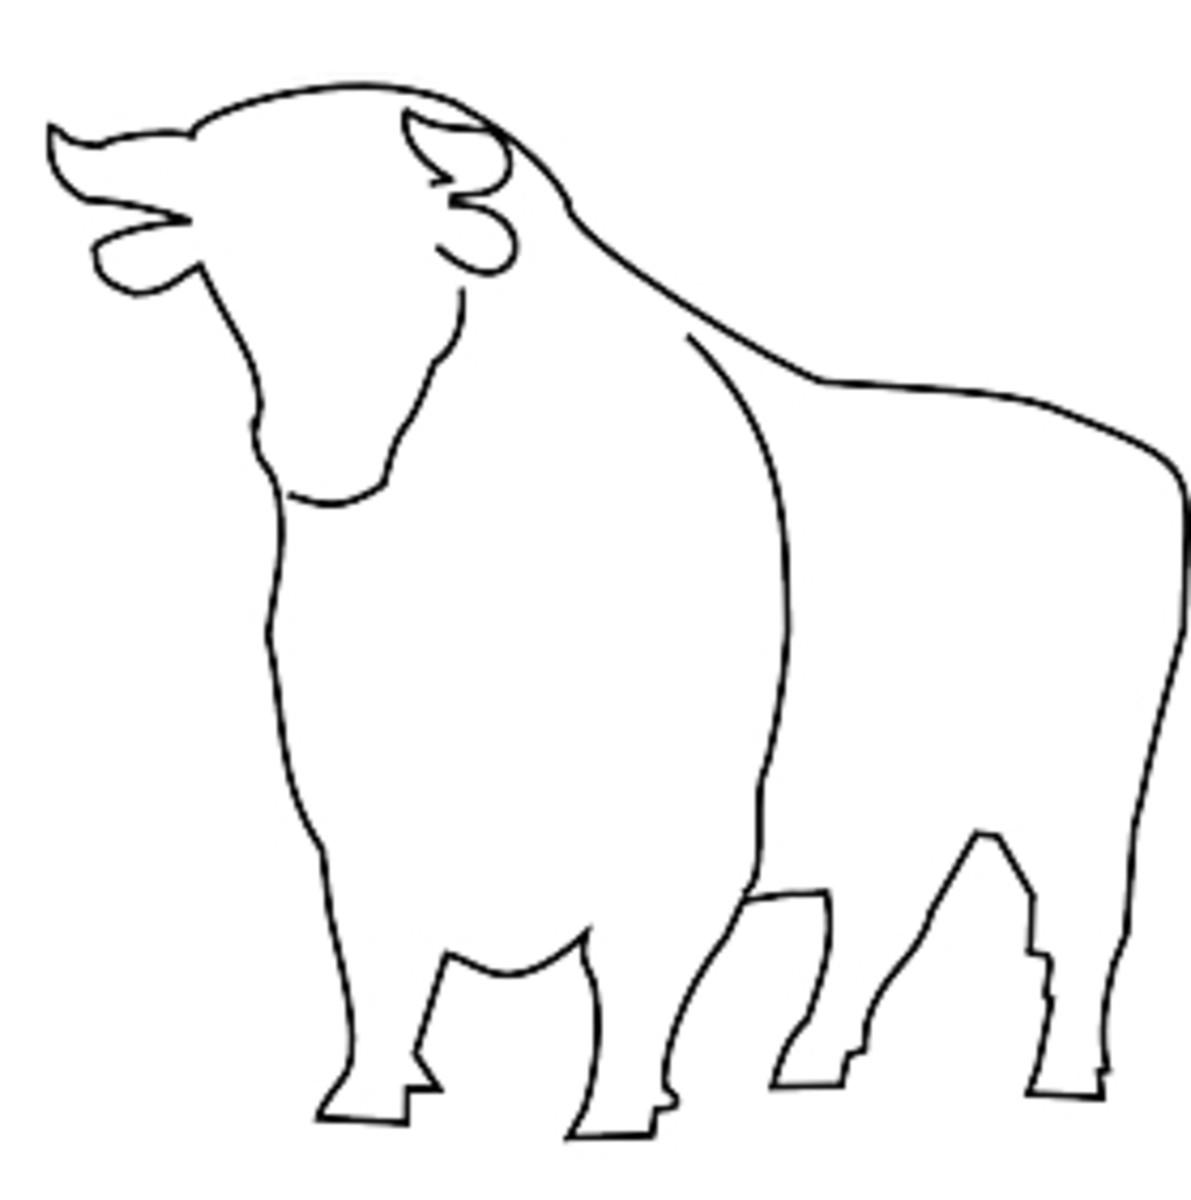 BullMarket0213